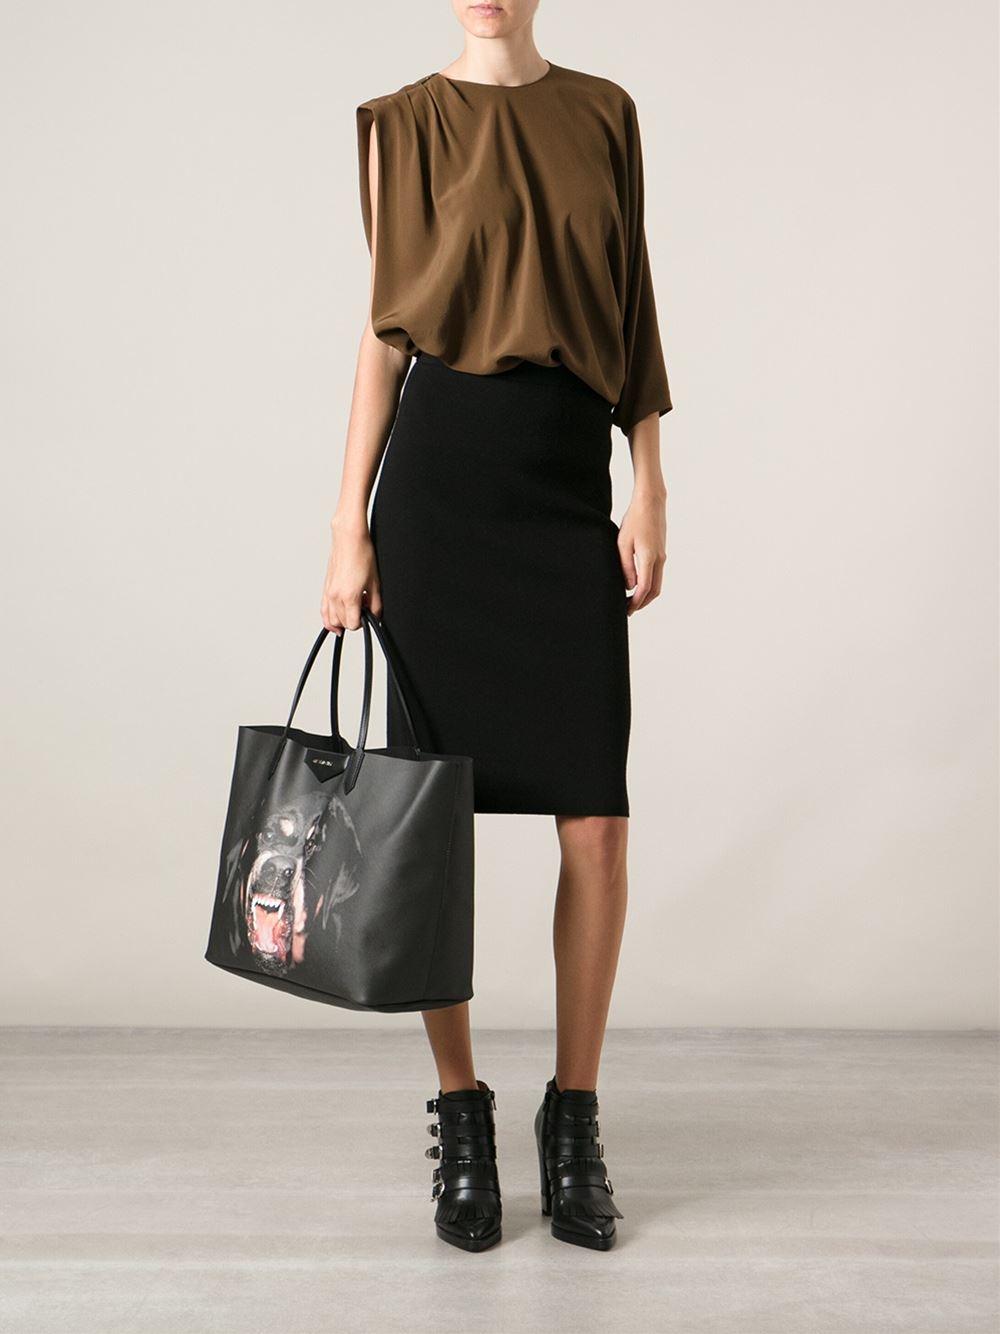 ee65e9d2526b Lyst - Givenchy Large  antigona  Shopper Tote in Black